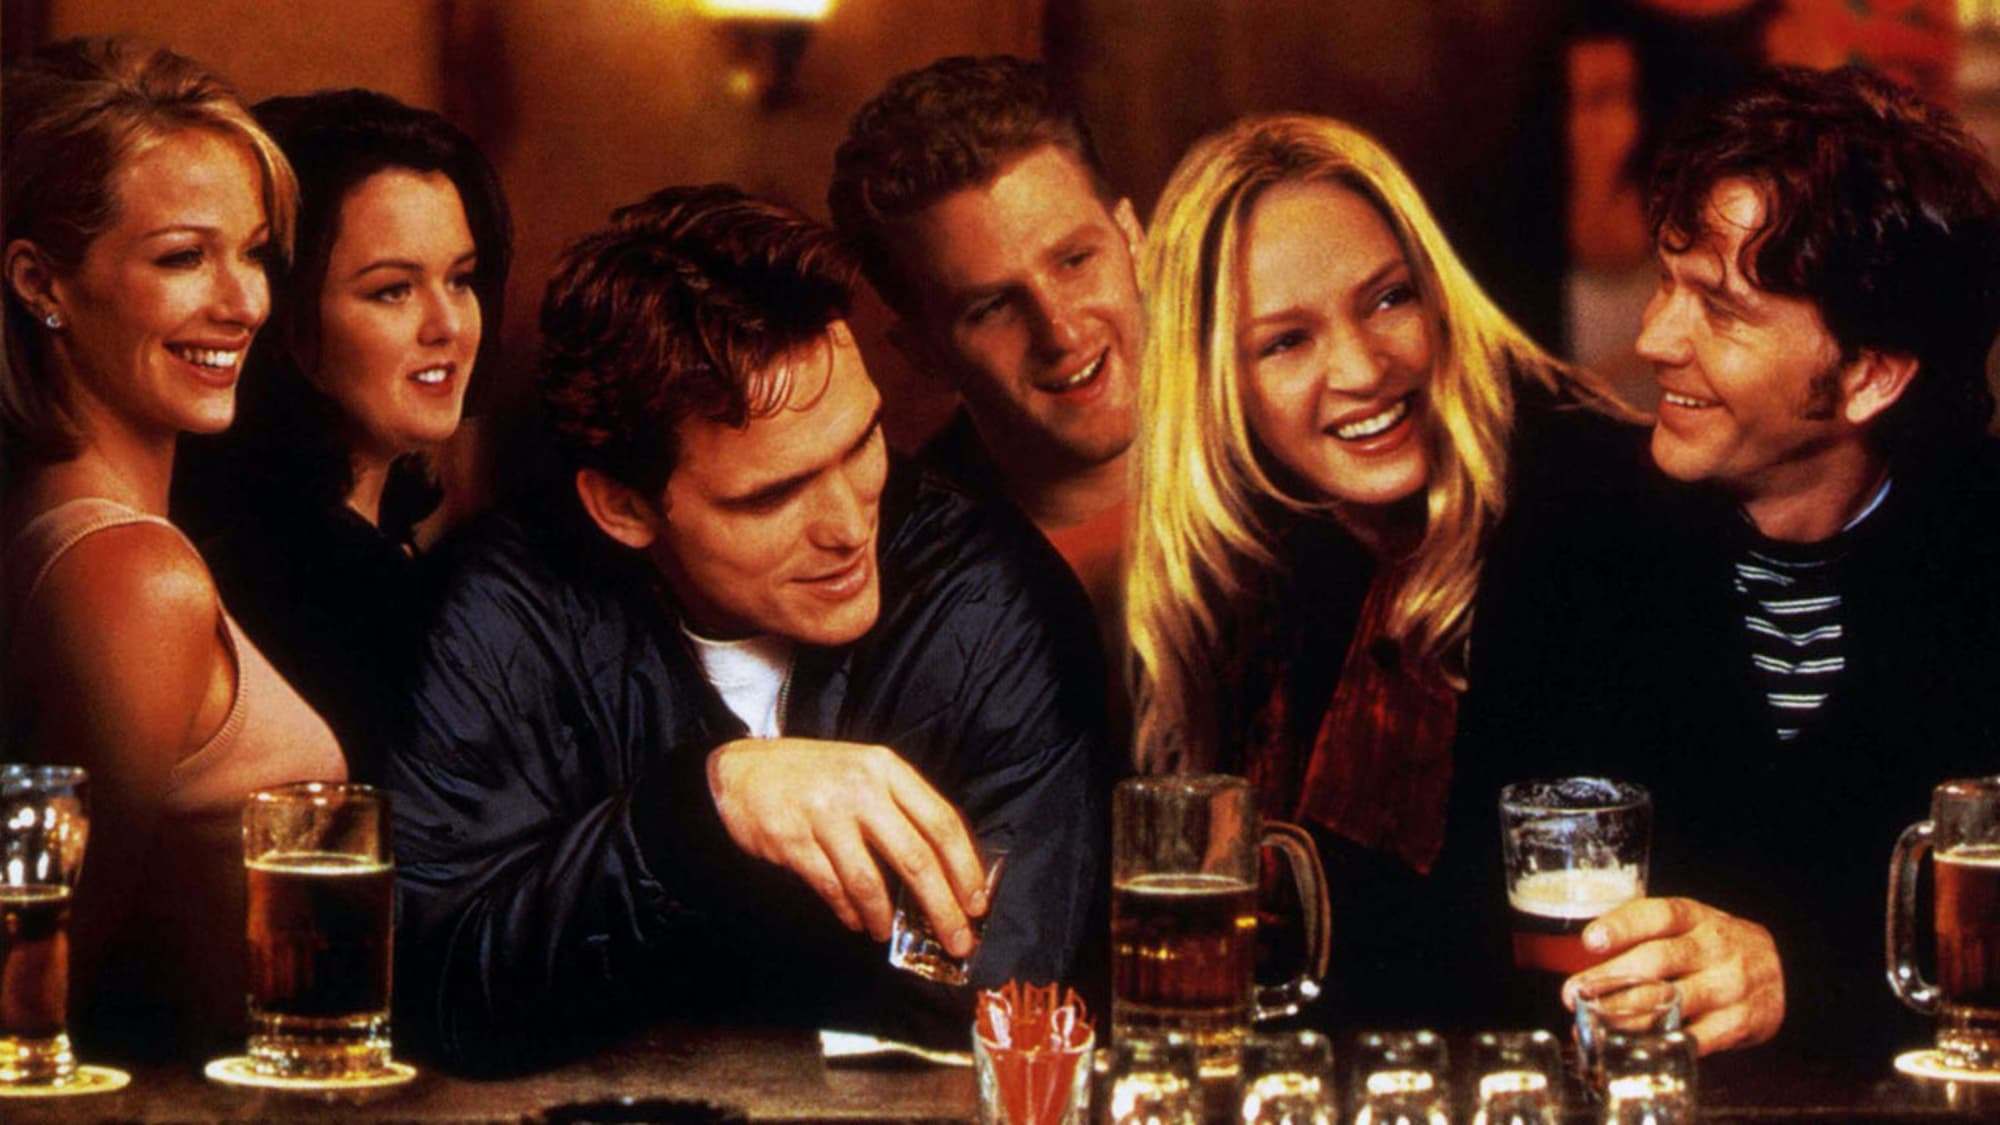 50 Best Romantic Movies on Netflix: Beautiful Girls